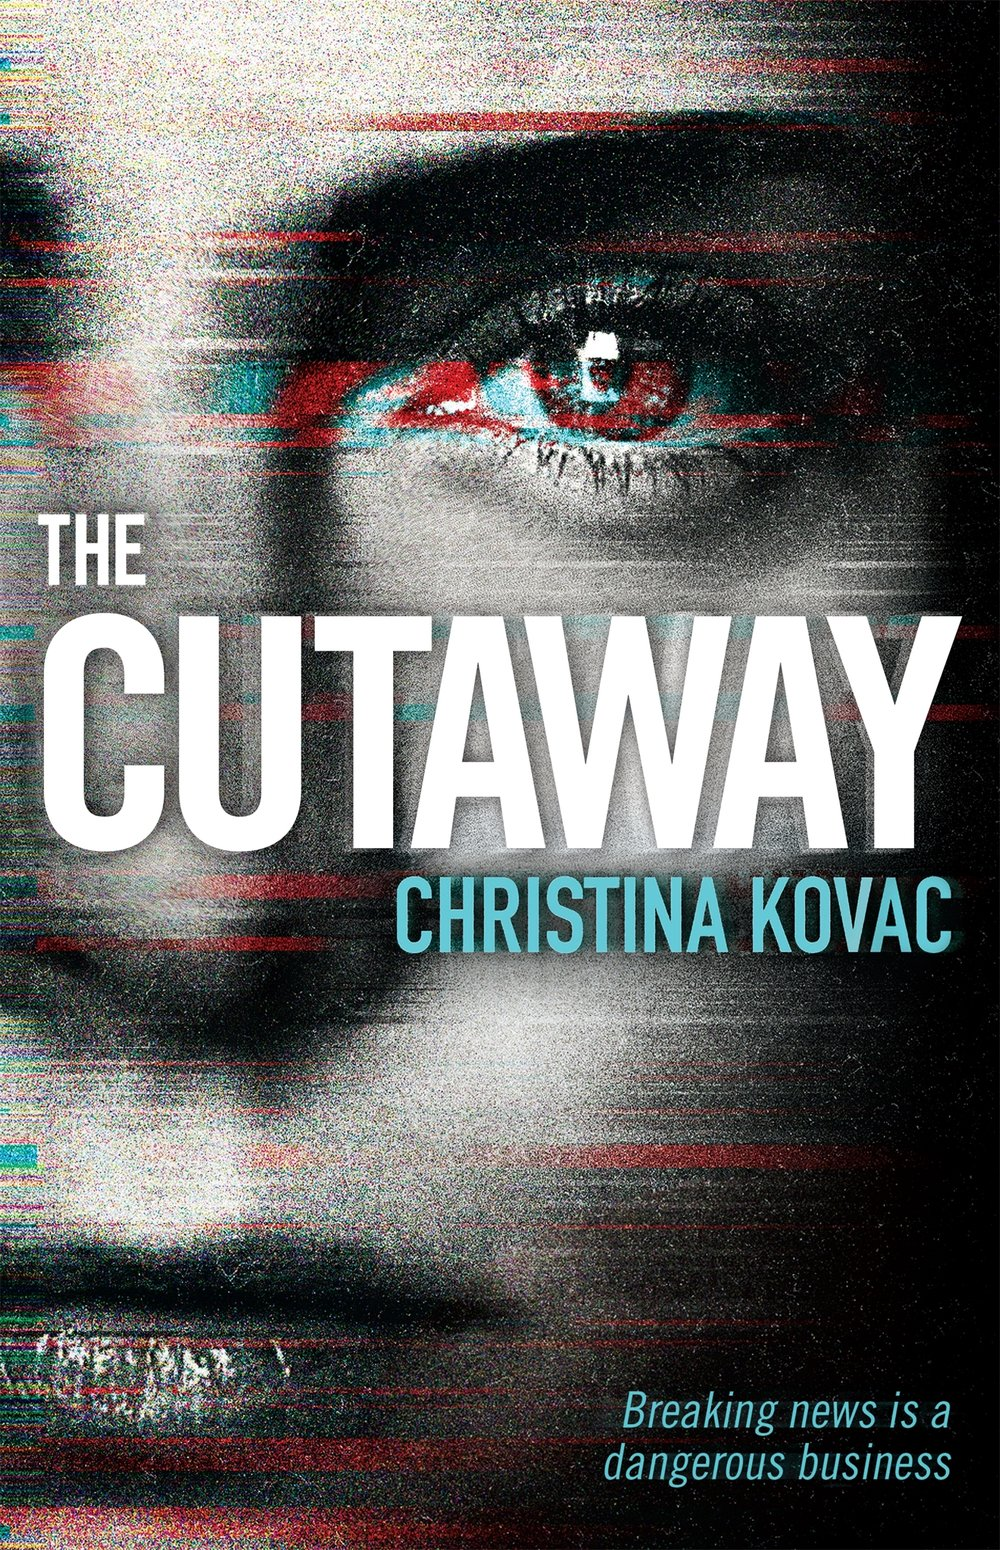 Buy the UK Edition of Christina Kovac's novel  The Cutaway